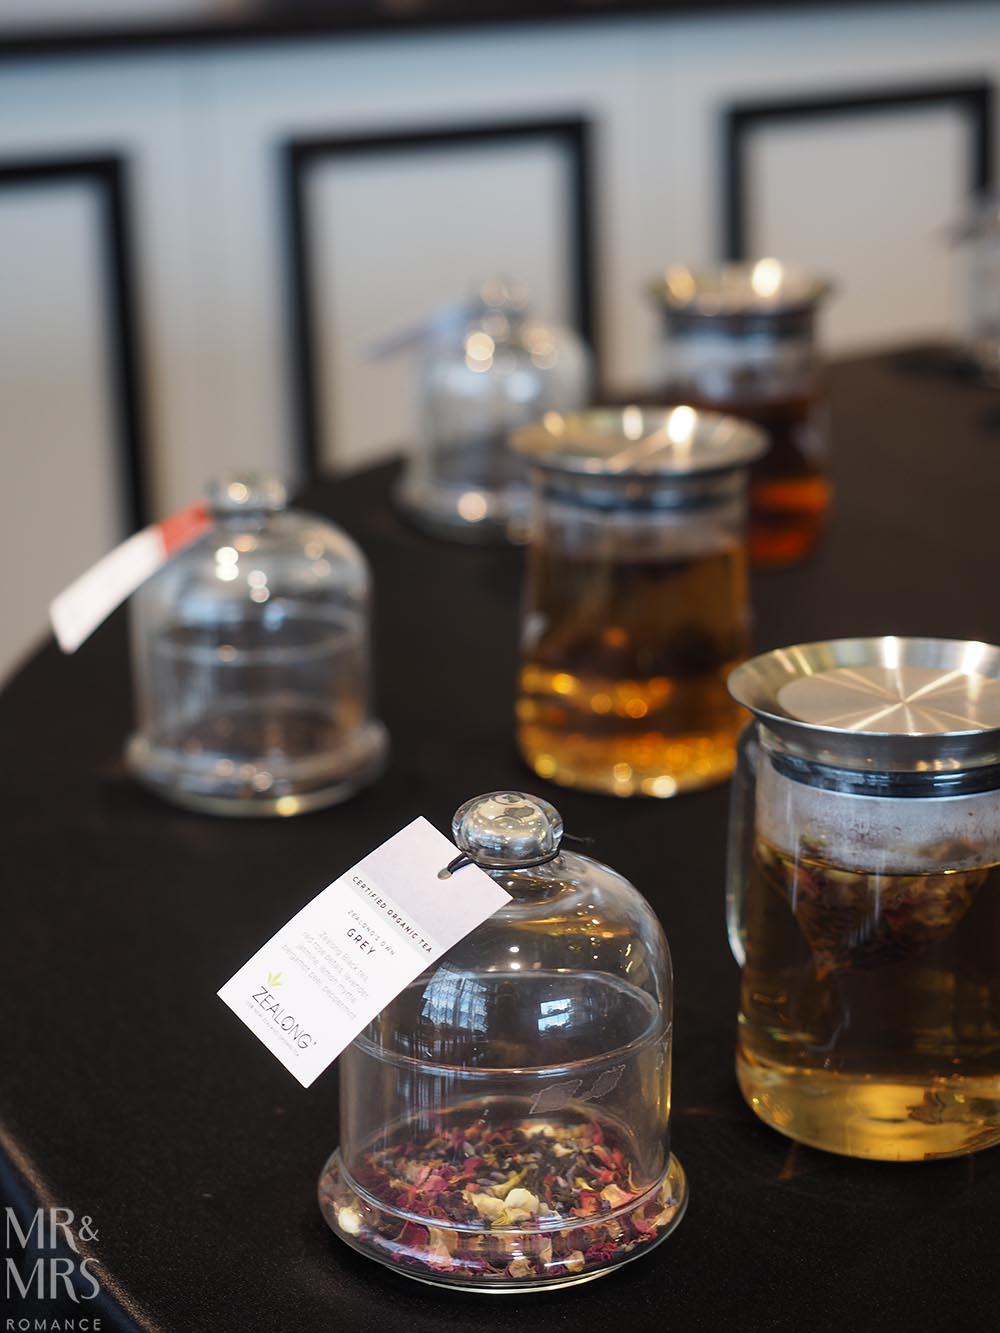 Zealong Tea Estate, Hamilton, Waikato, New Zealand - tea tasting